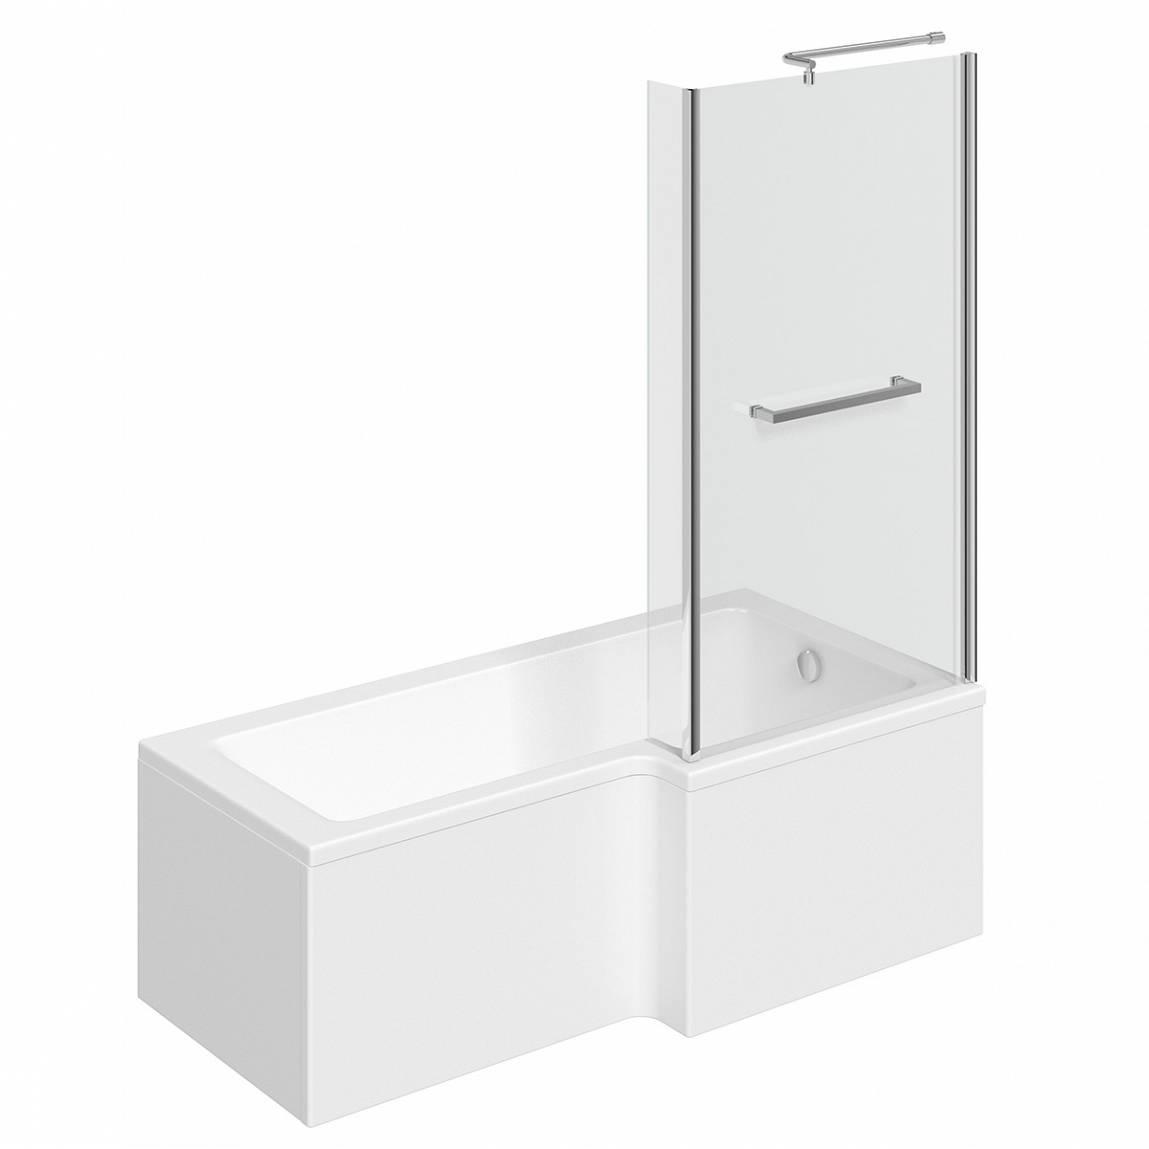 Image of Boston Shower Bath 1500 x 850 RH inc. Screen & Towel Rail